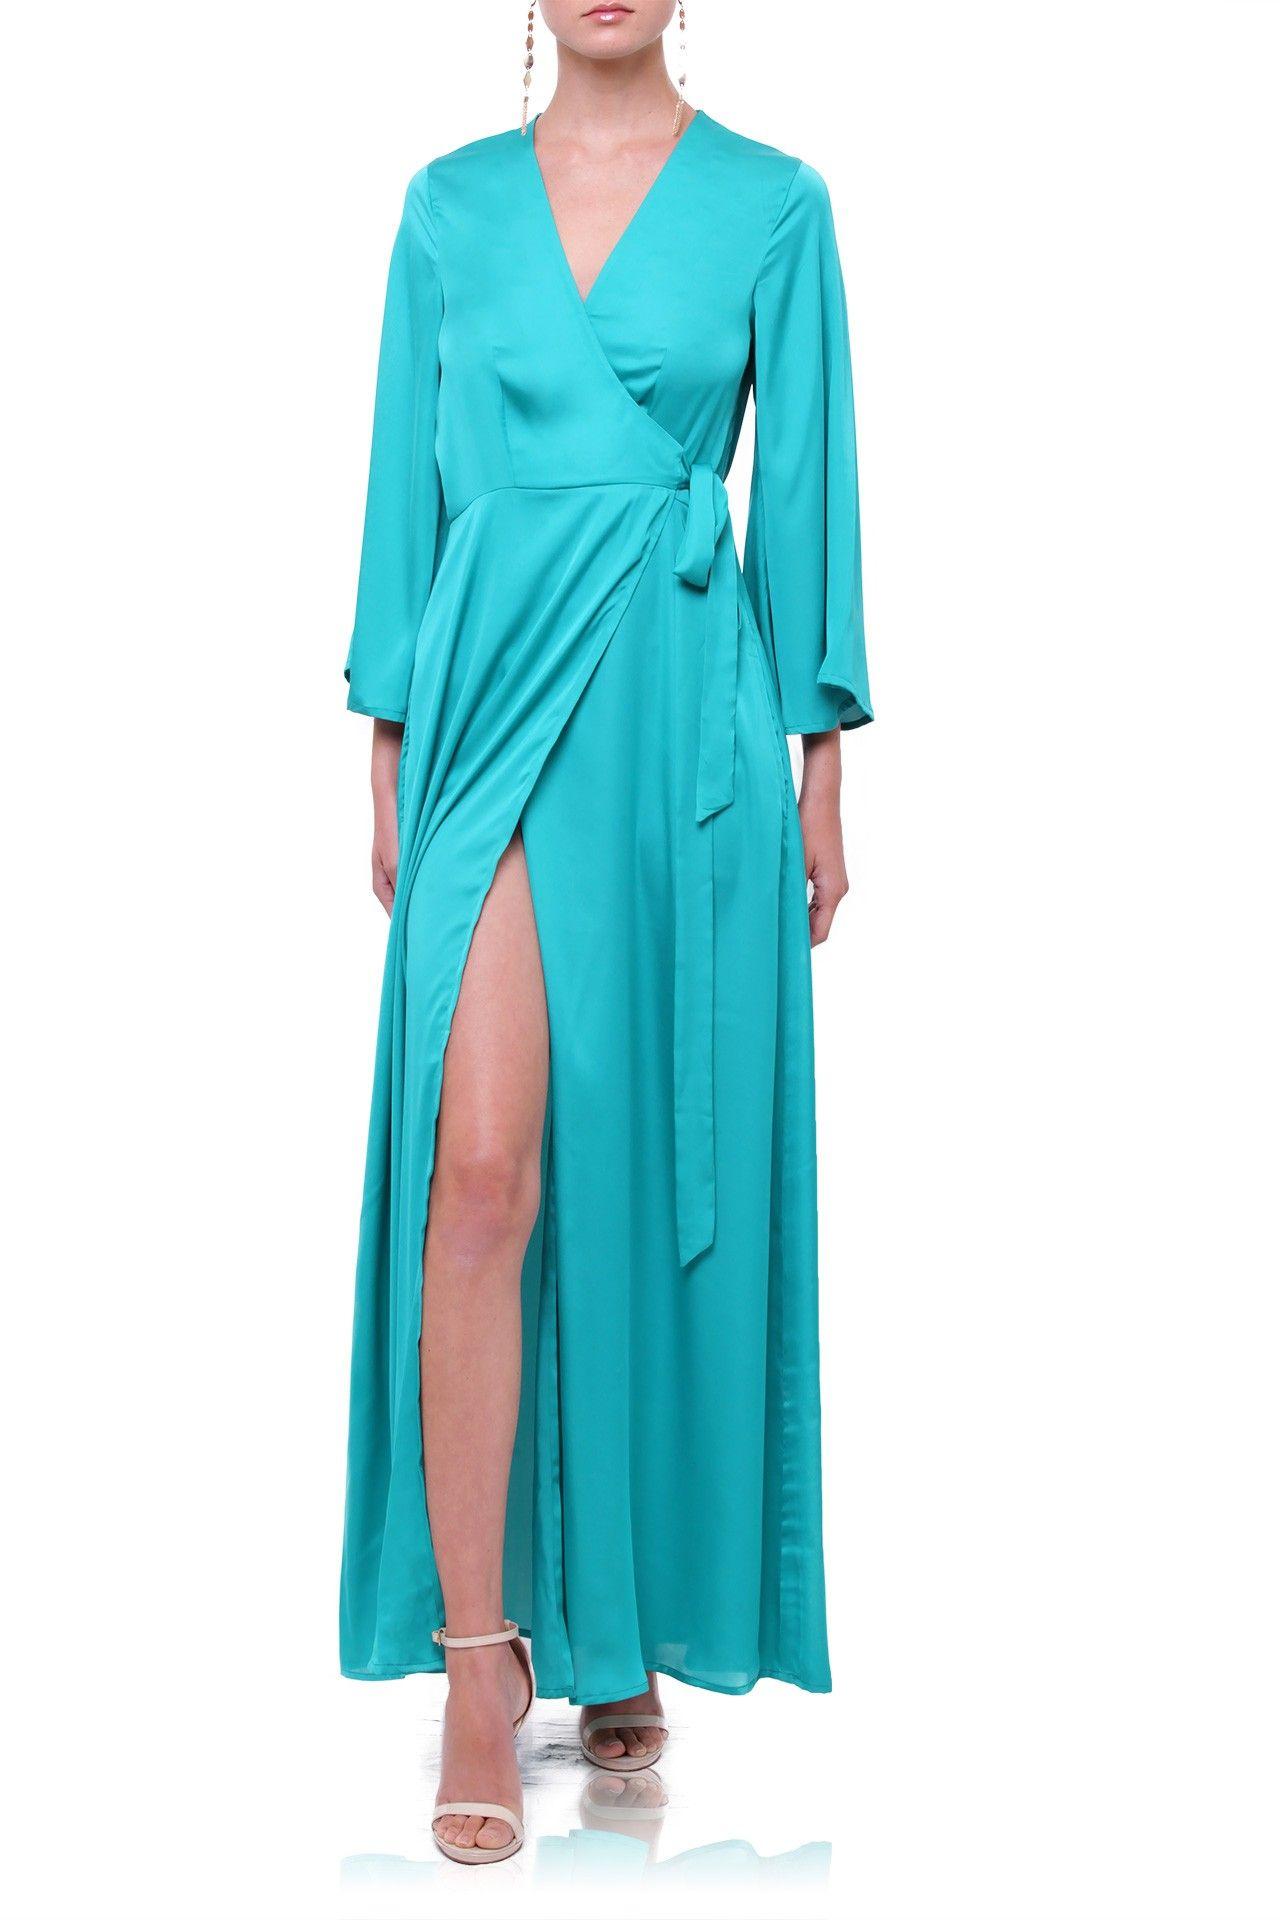 6a8724b990a Turquoise Silk Maxi Wrap Dress